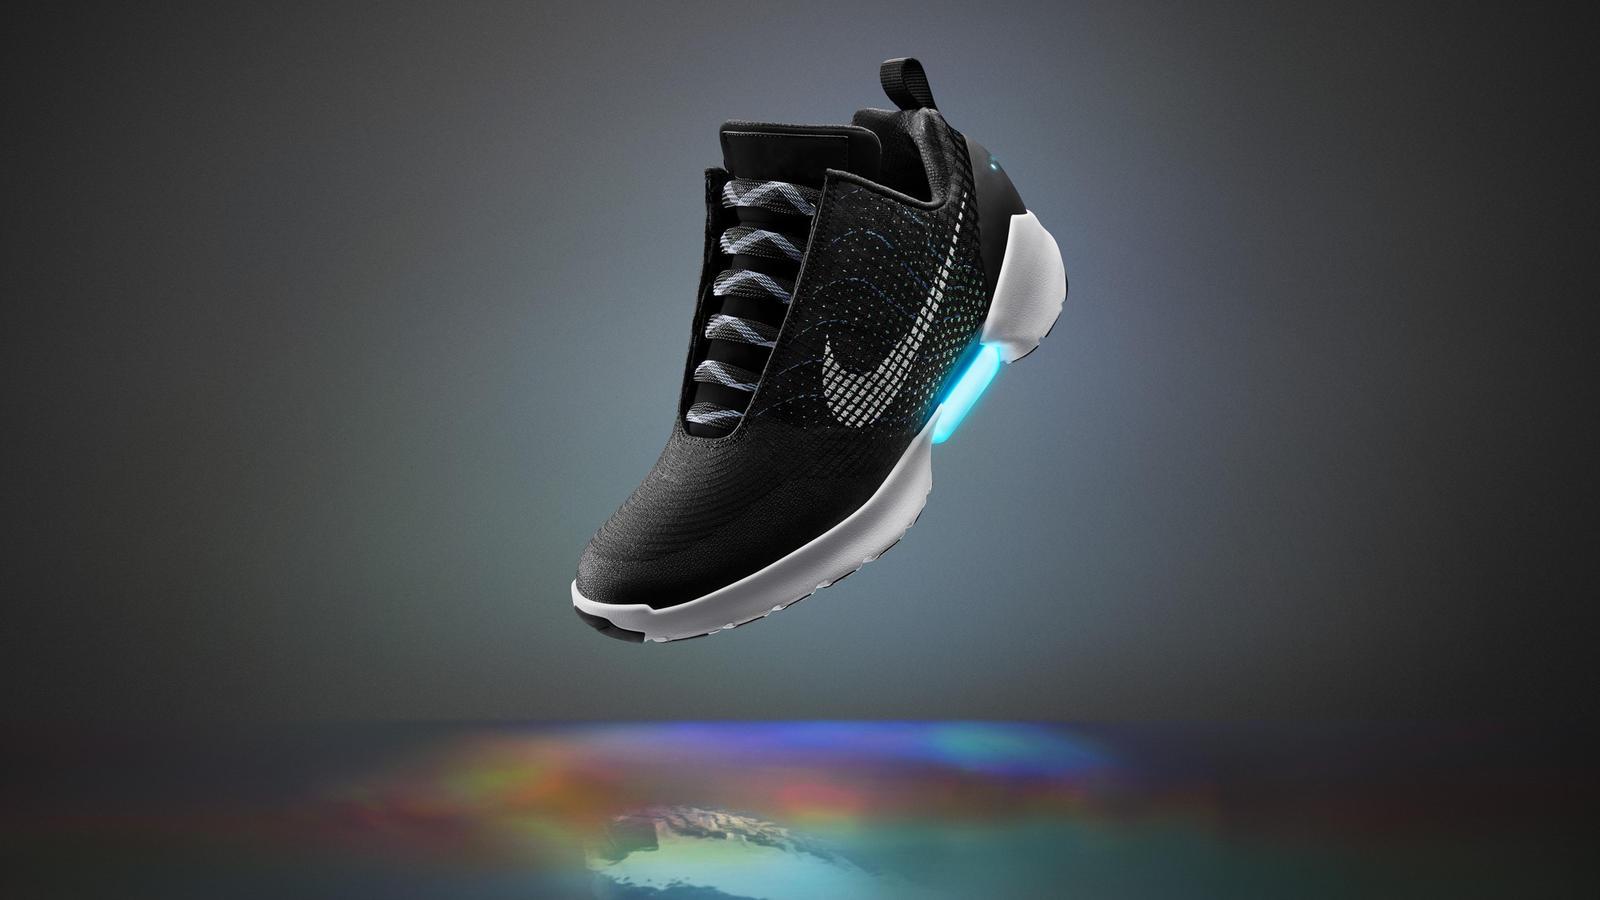 Nike HyperAdapt 1.0: Self Lacing Shoes